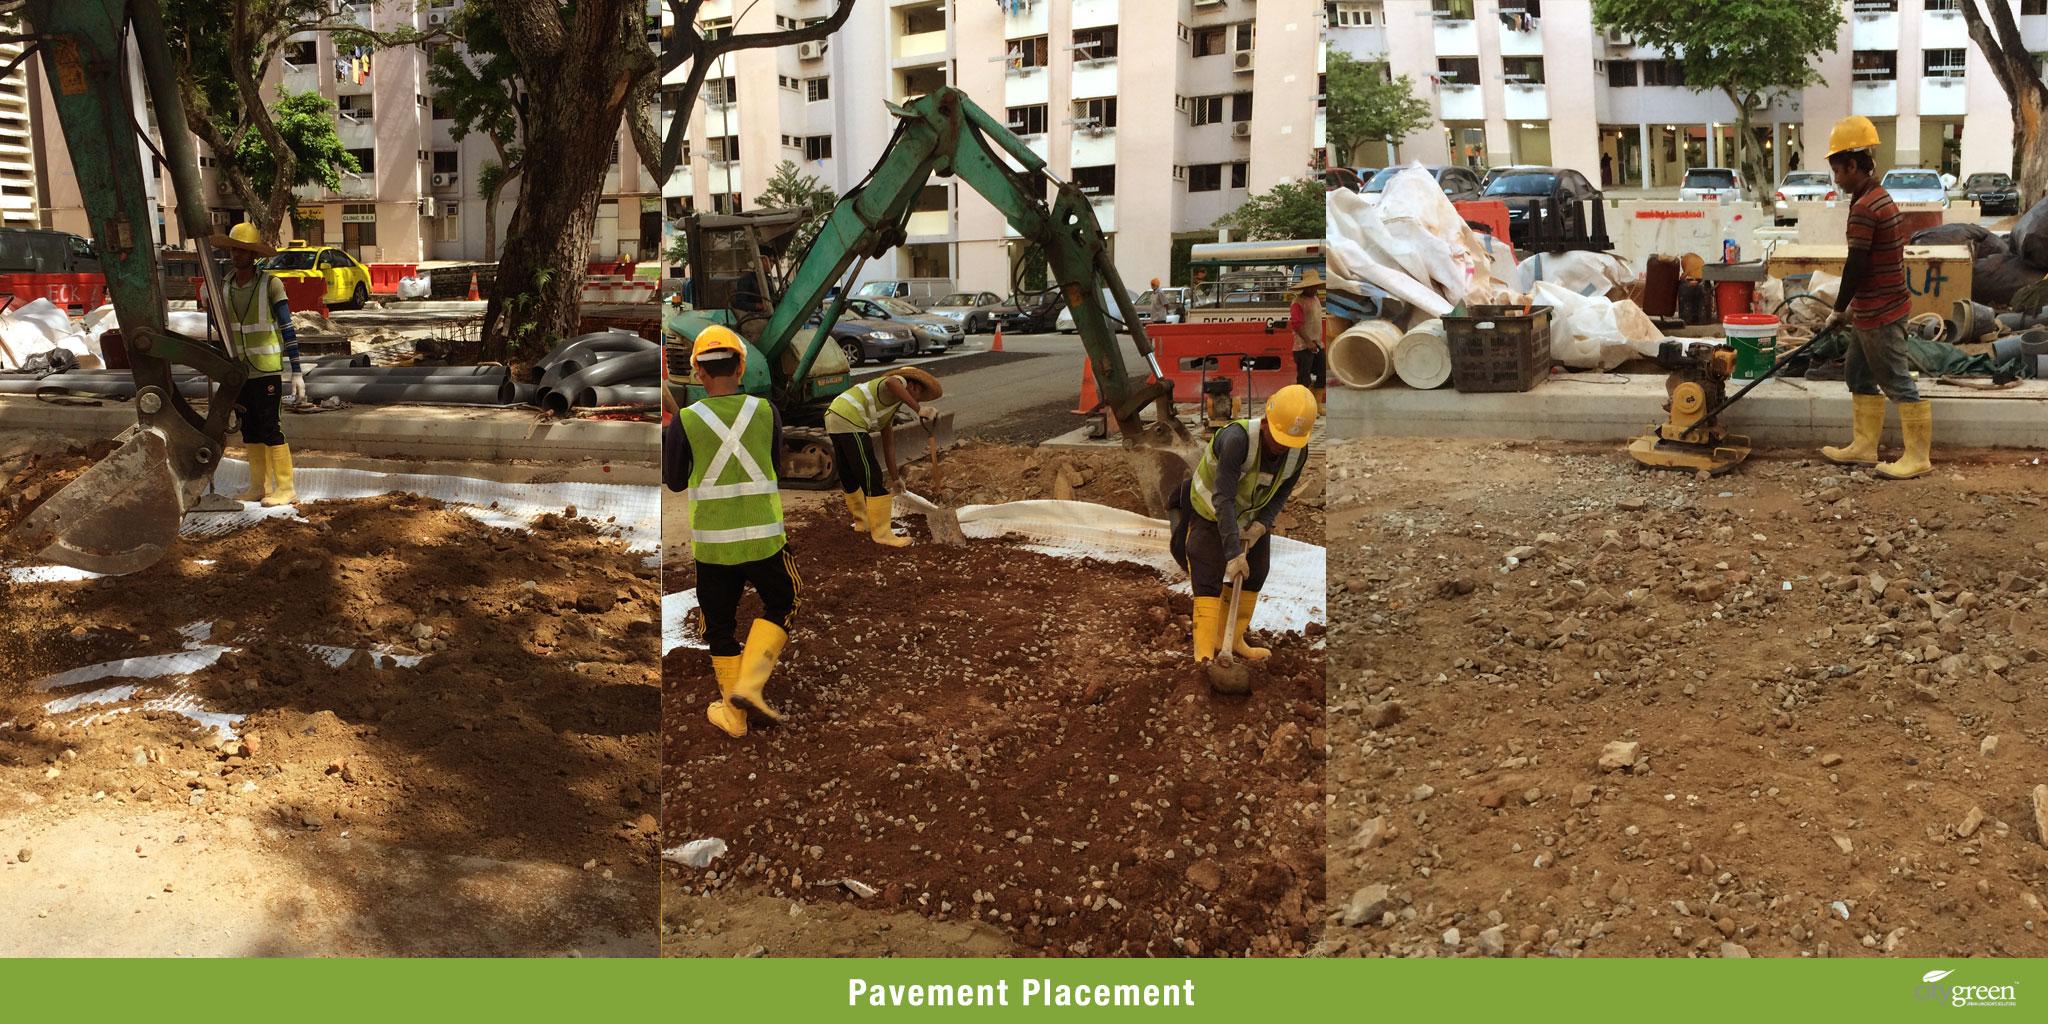 Pavement-Placement